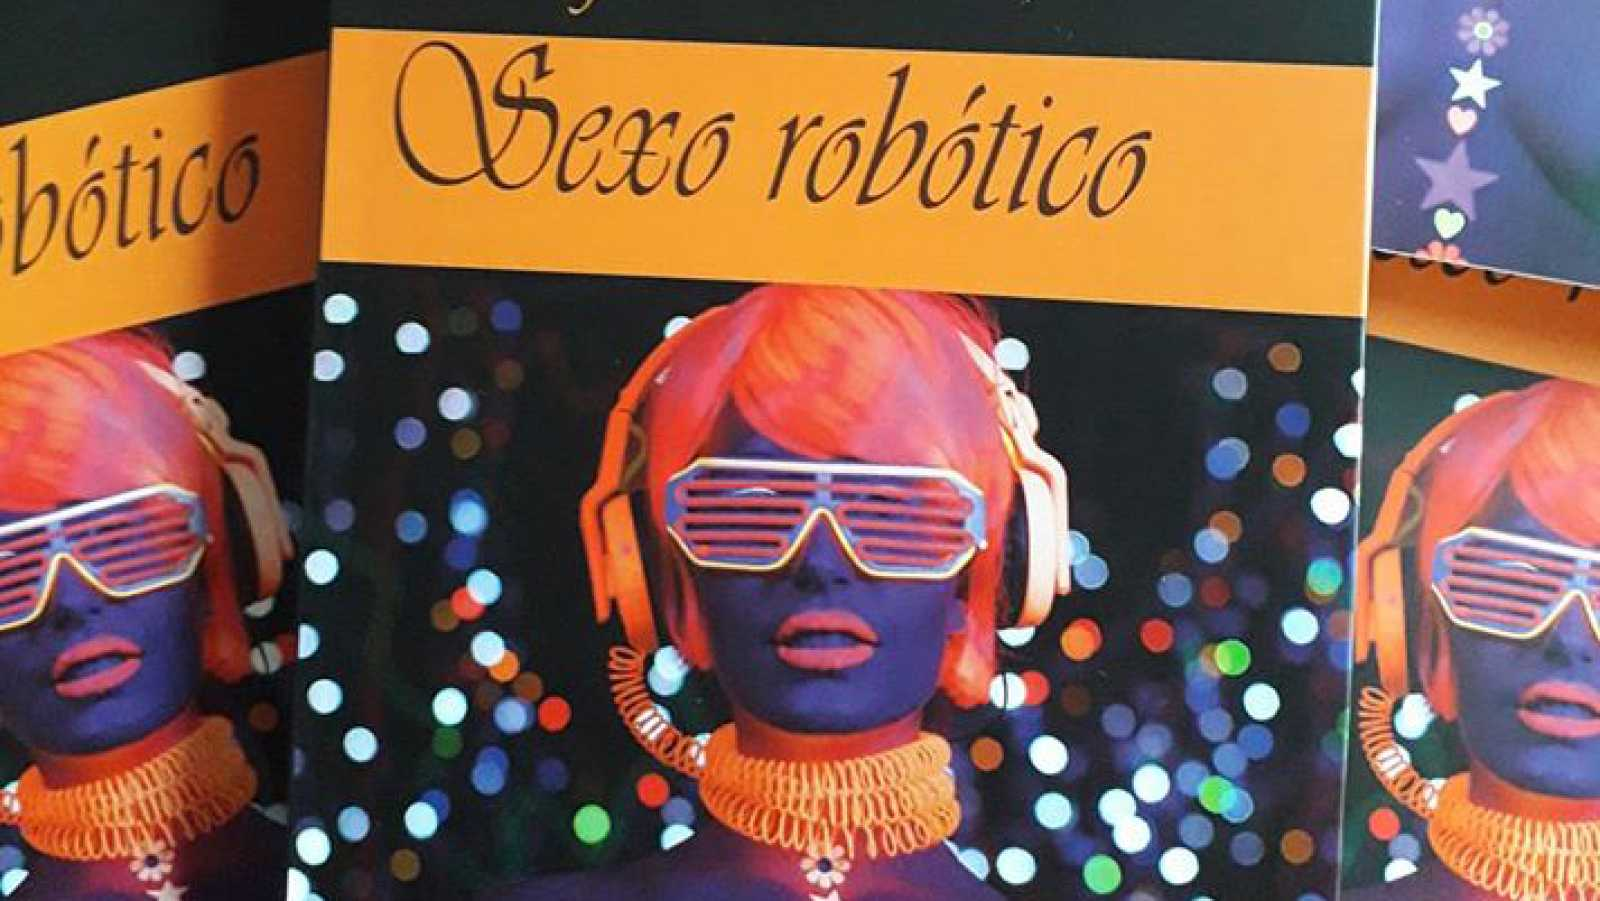 Sexto continente - Sexo robótico, el futuro ya está aquí - 18/01/20 - escuchar ahora